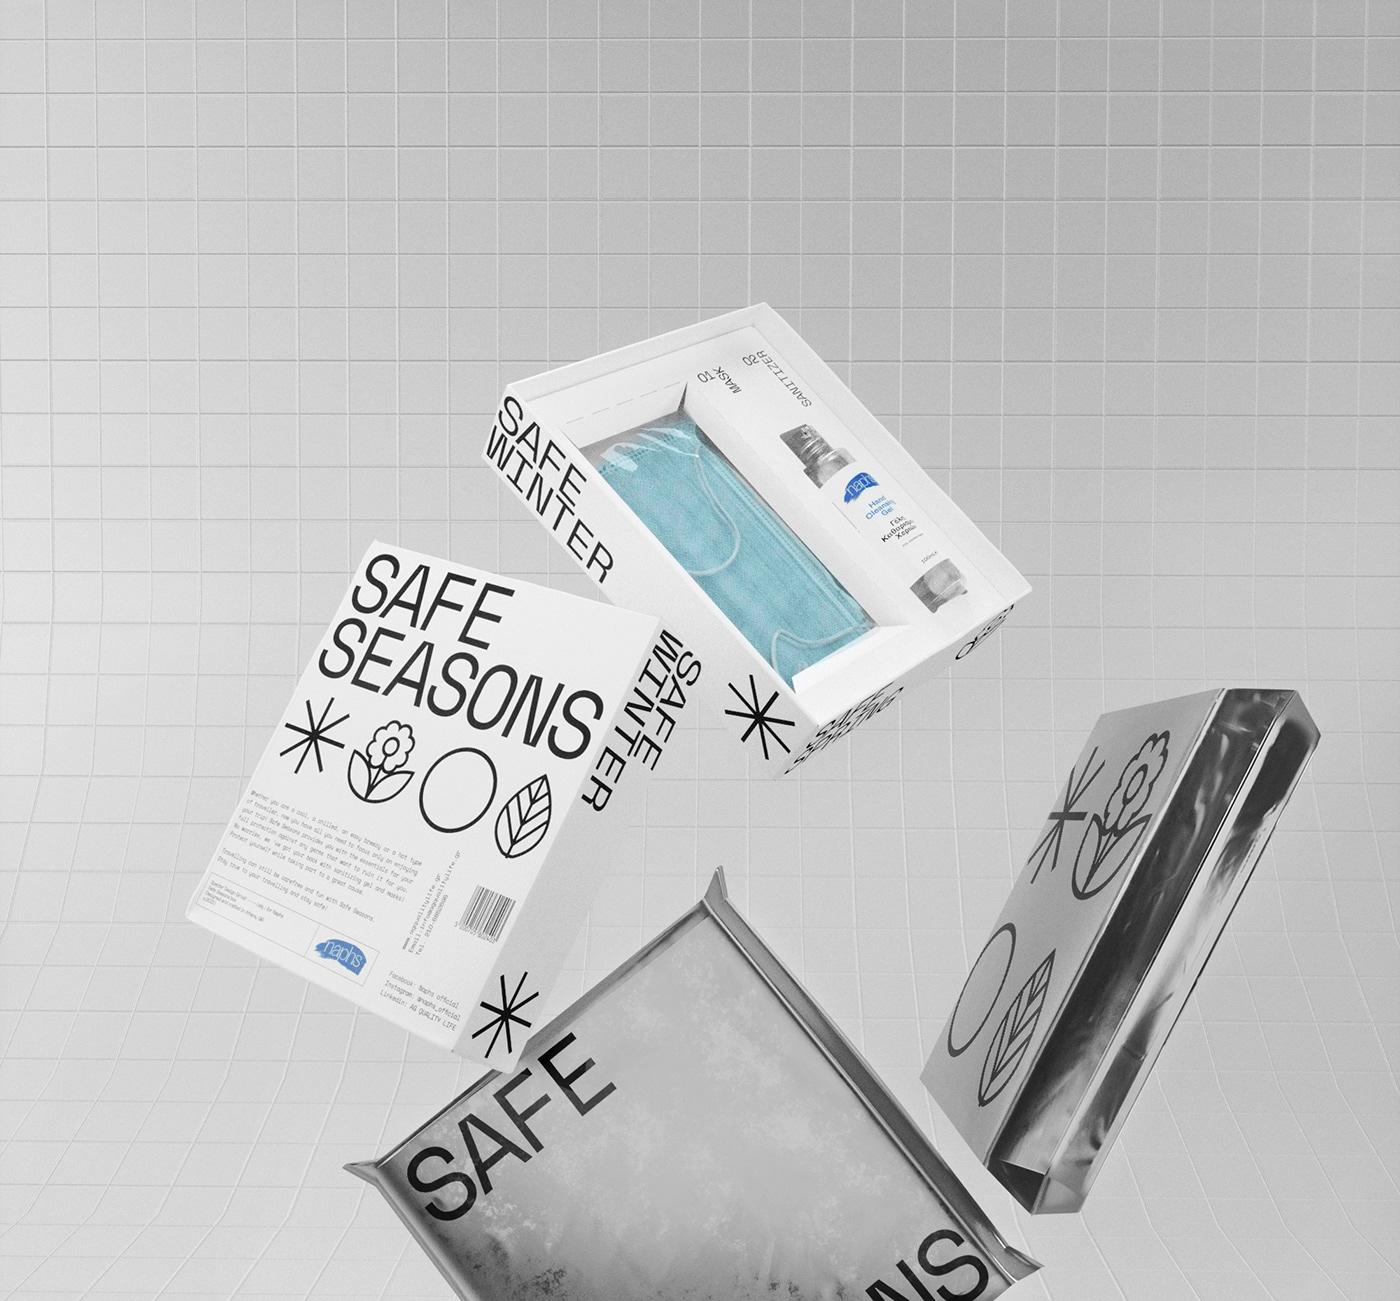 3D 3dmodeling CGI design kit mask sanitizer virus visual Packaging